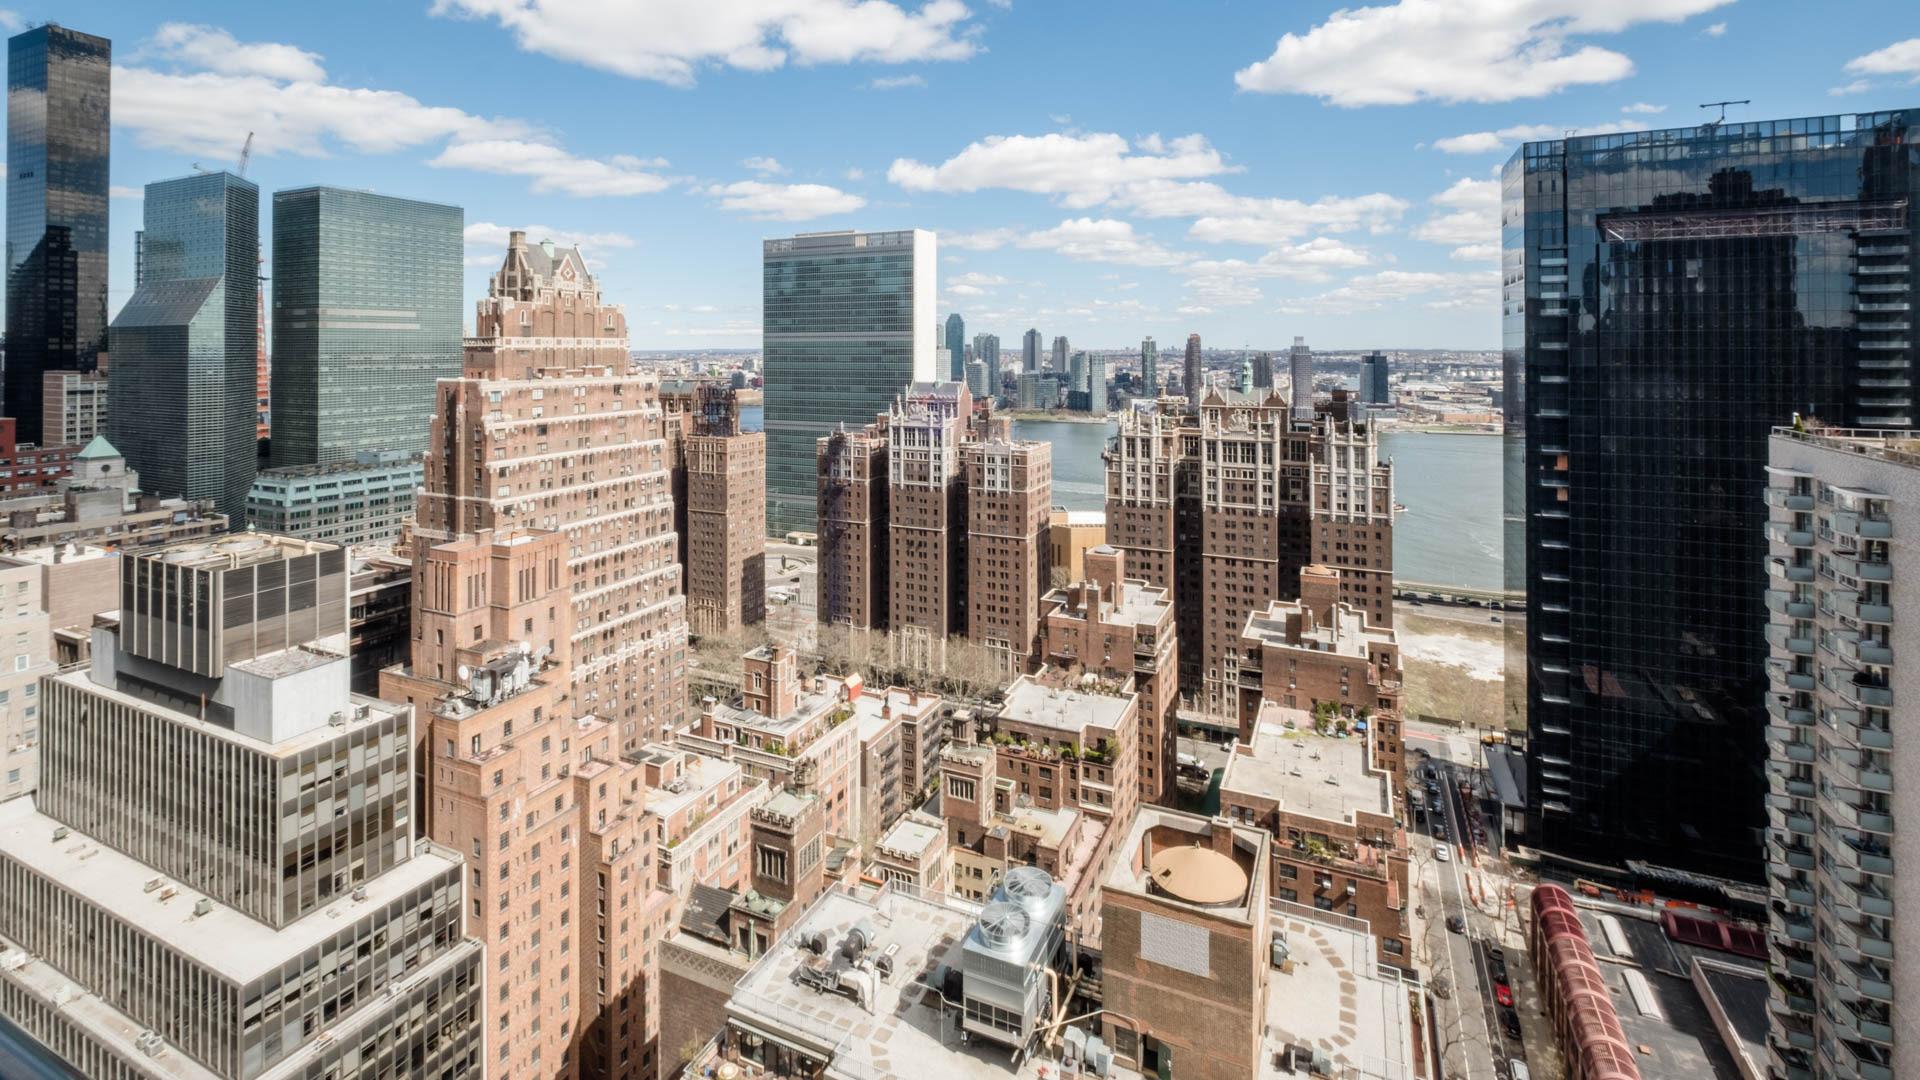 300 East 39th Apartments - Neighborhood